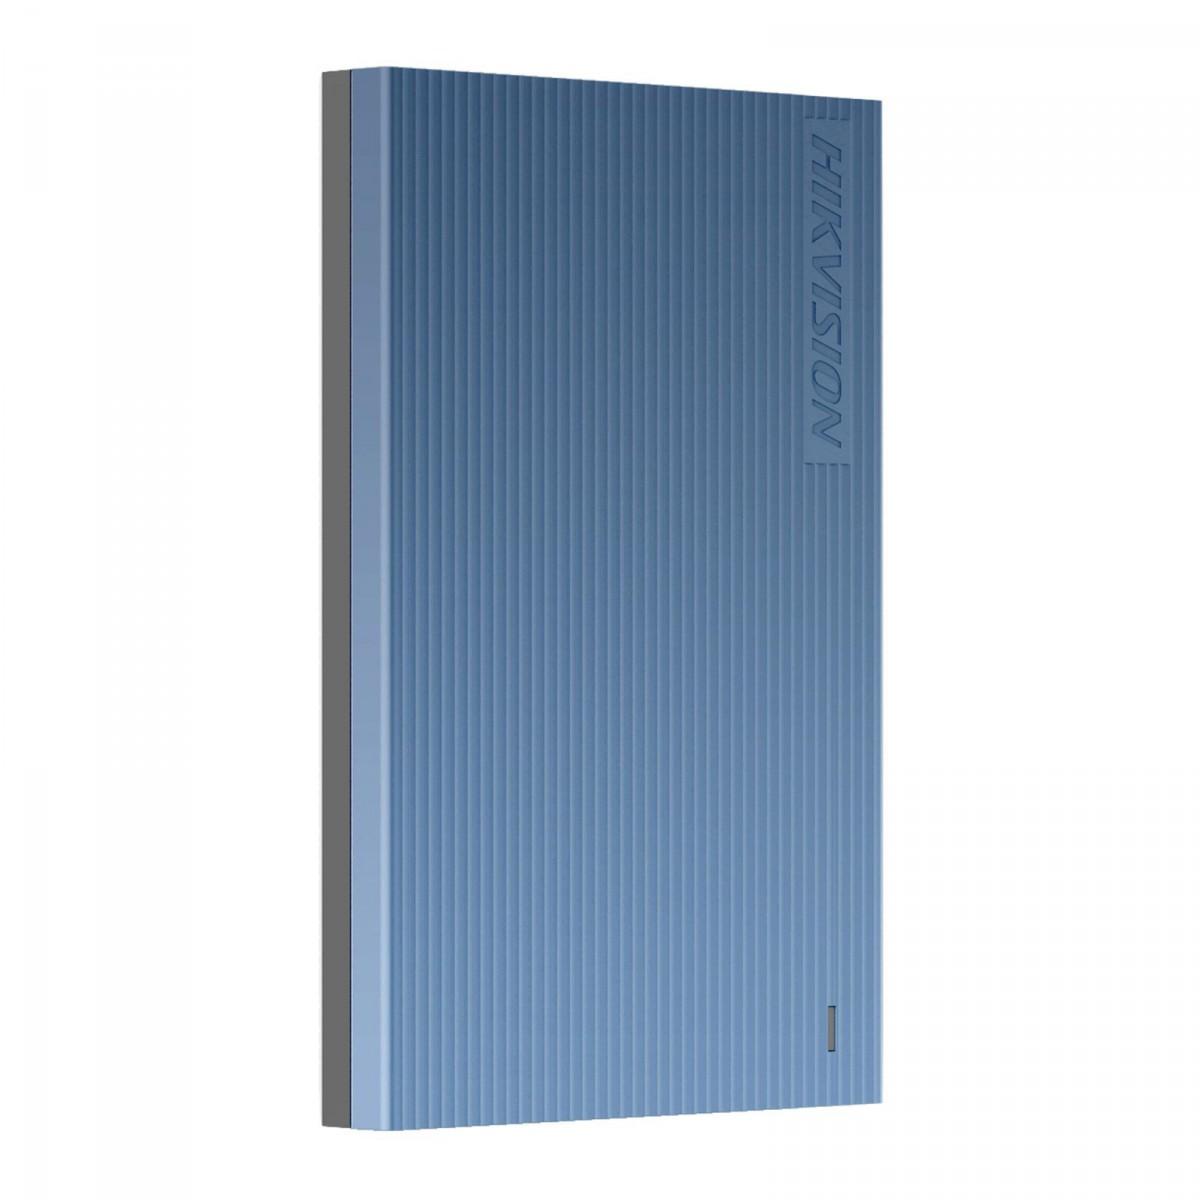 HD Externo Hikvision T30,2TB, USB 3.0, BLUE, HS-EHDD-T30-2T-BLUE